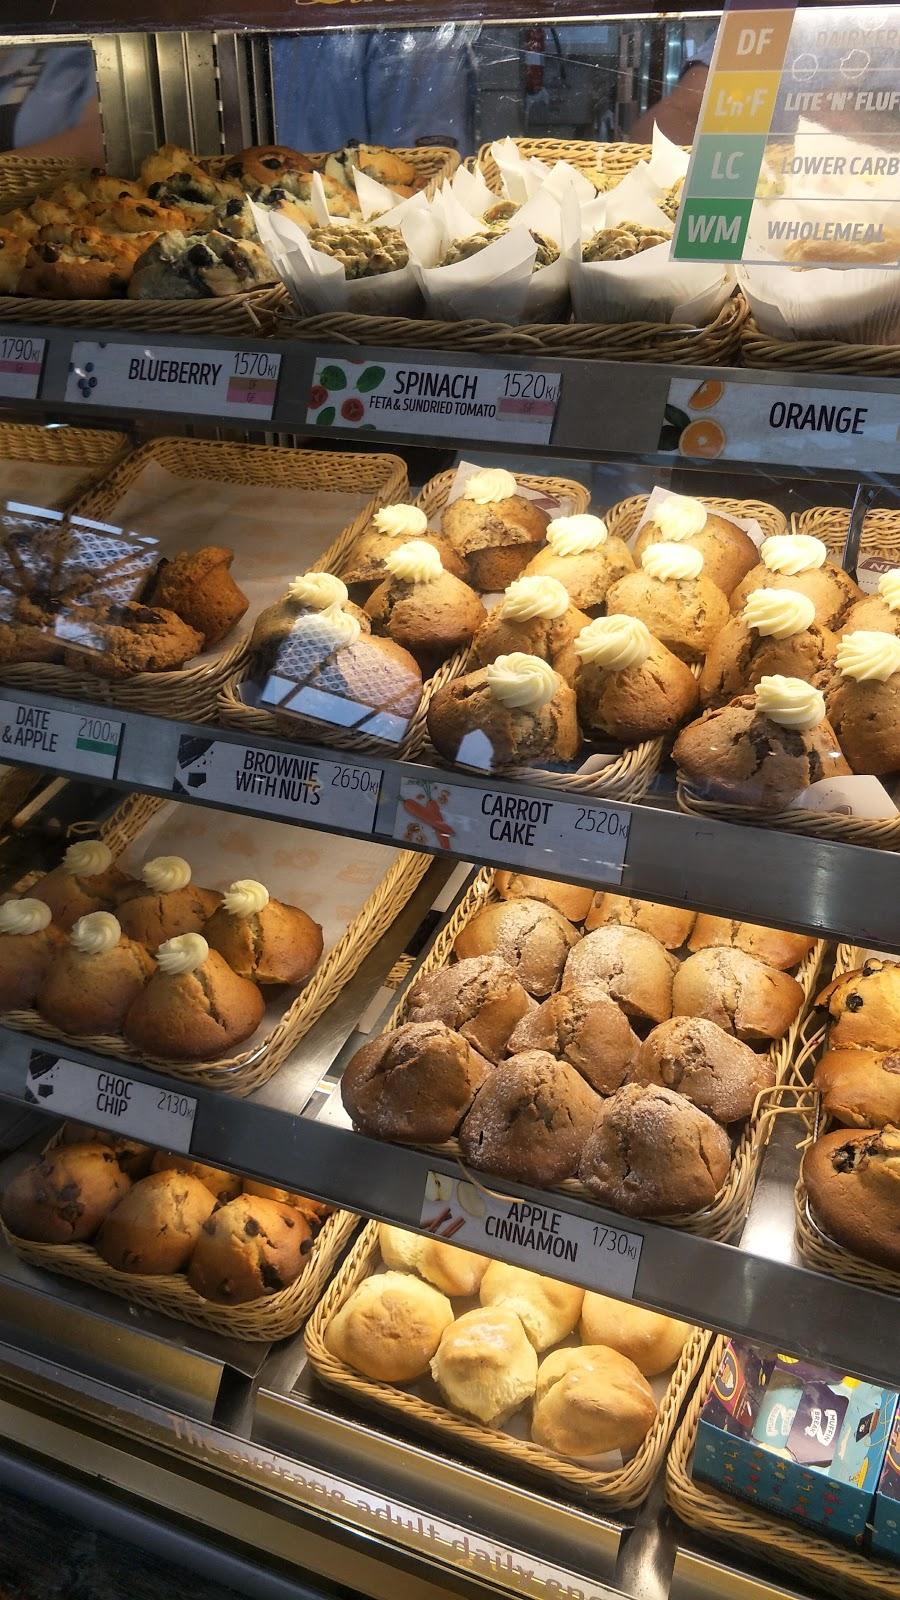 Muffin Break Greensborough | bakery | 25 Main St, Greensborough VIC 3087, Australia | 0394323338 OR +61 3 9432 3338